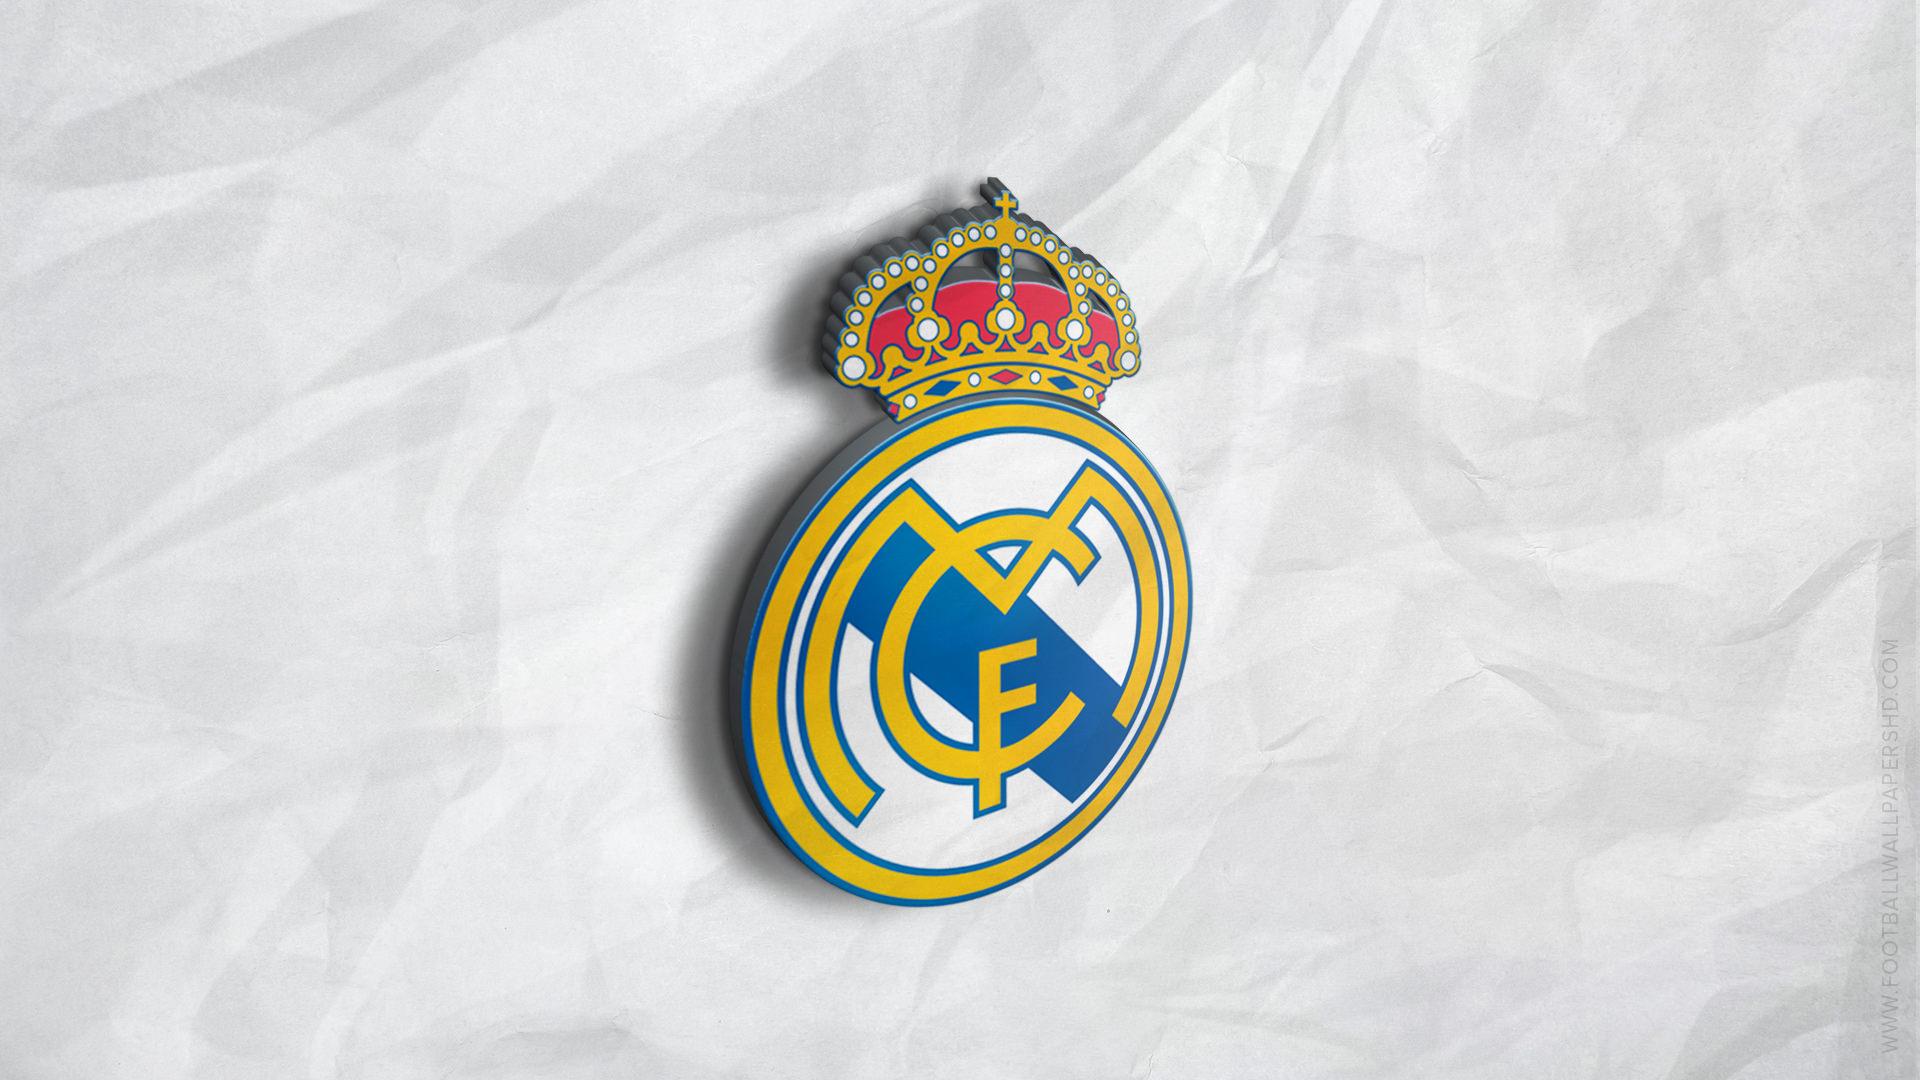 realmadrid3dlogofootballimagewallpaper soy madridista